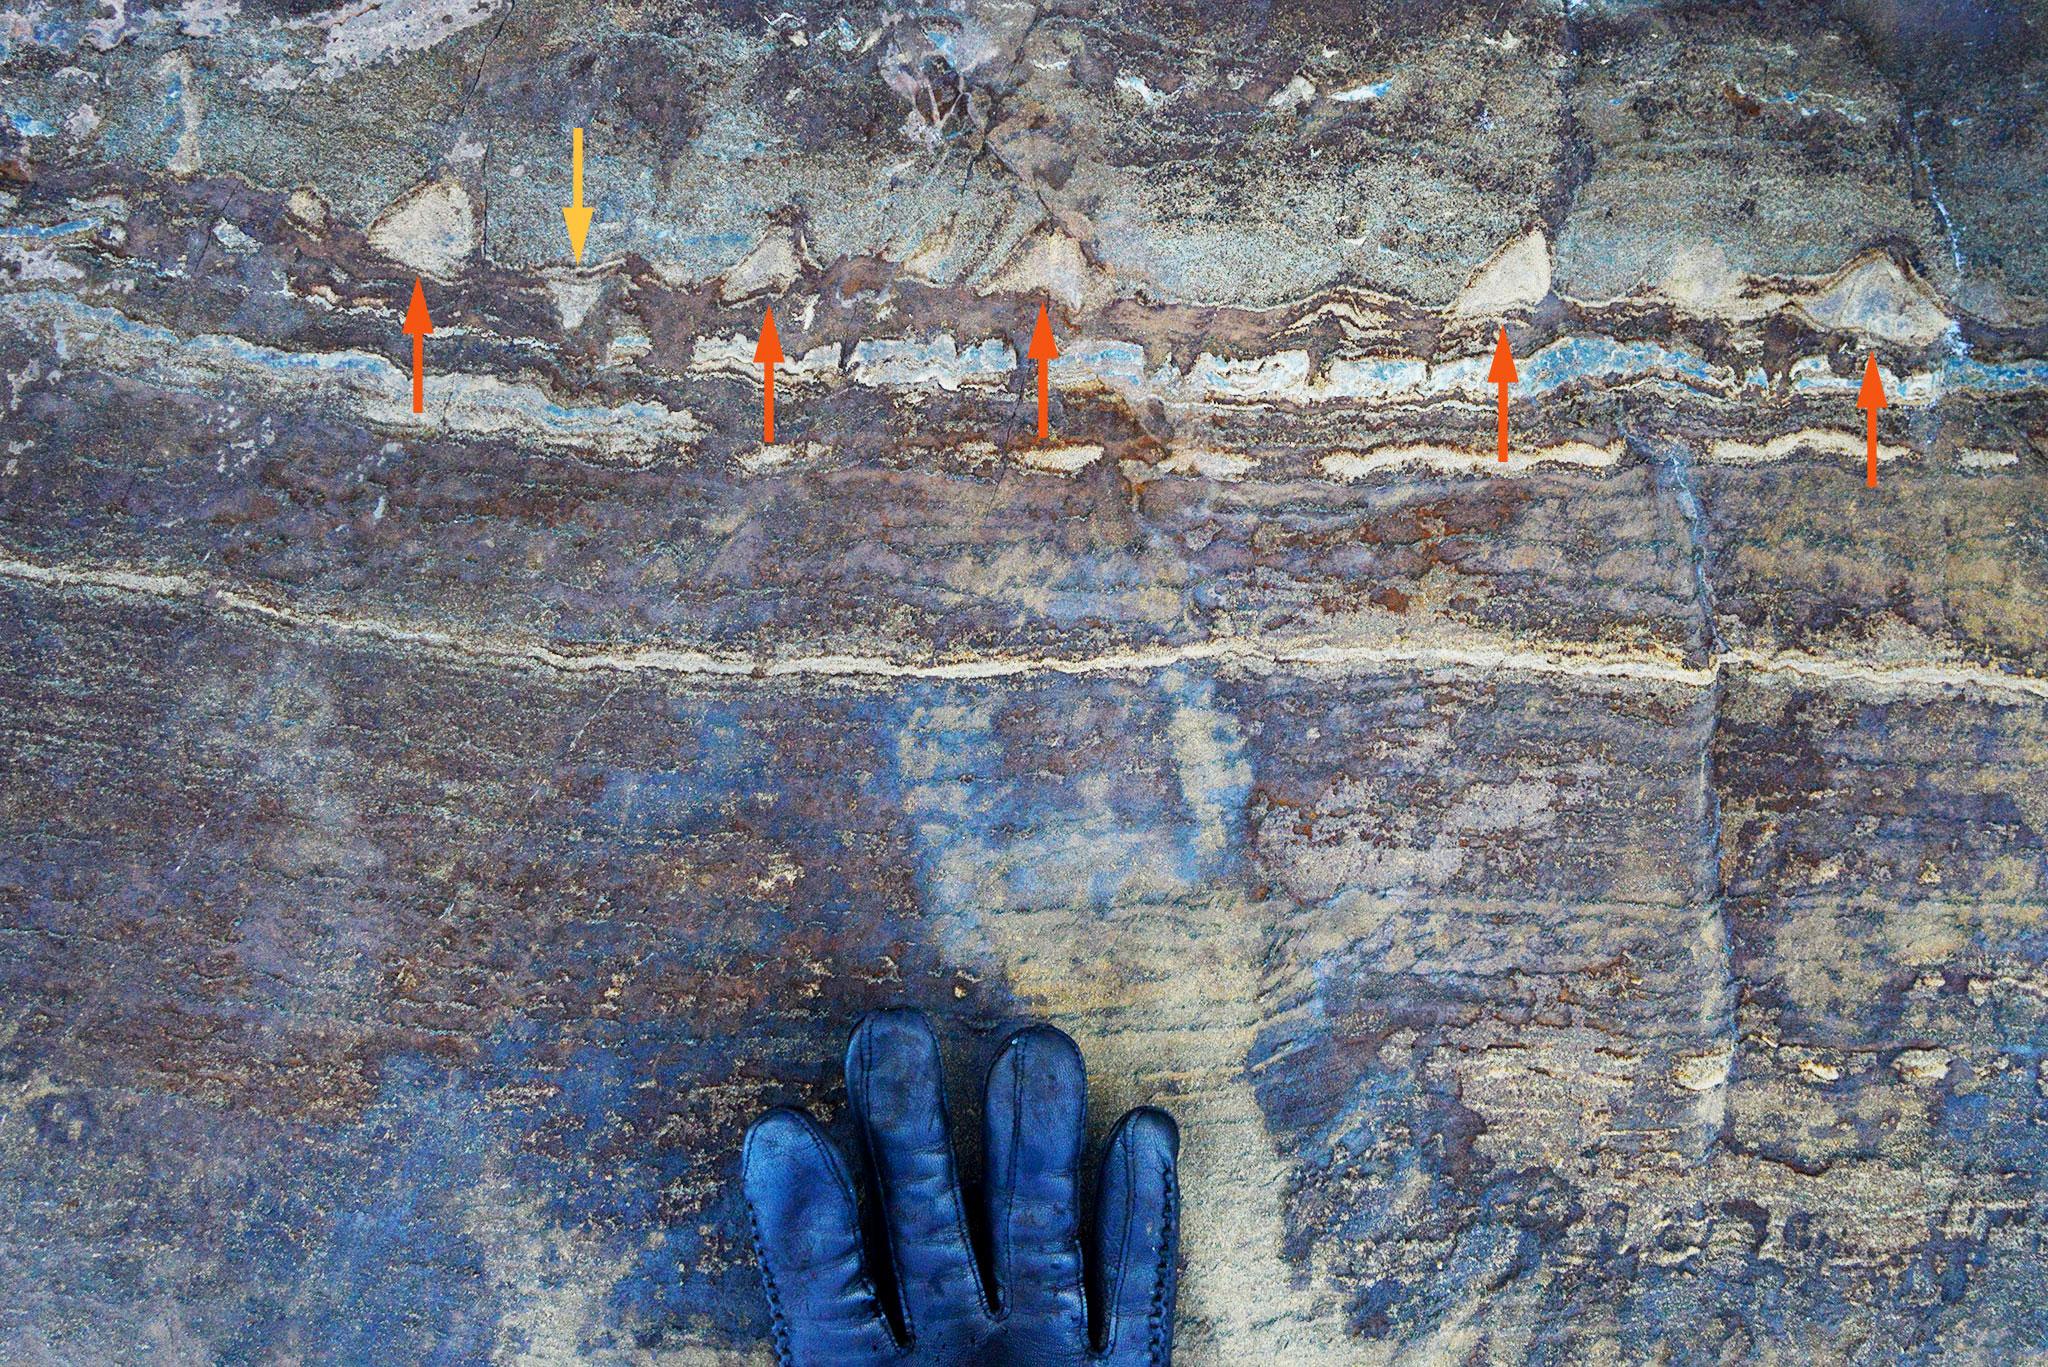 Stromatolites_Lede1300_redarrows.jpg